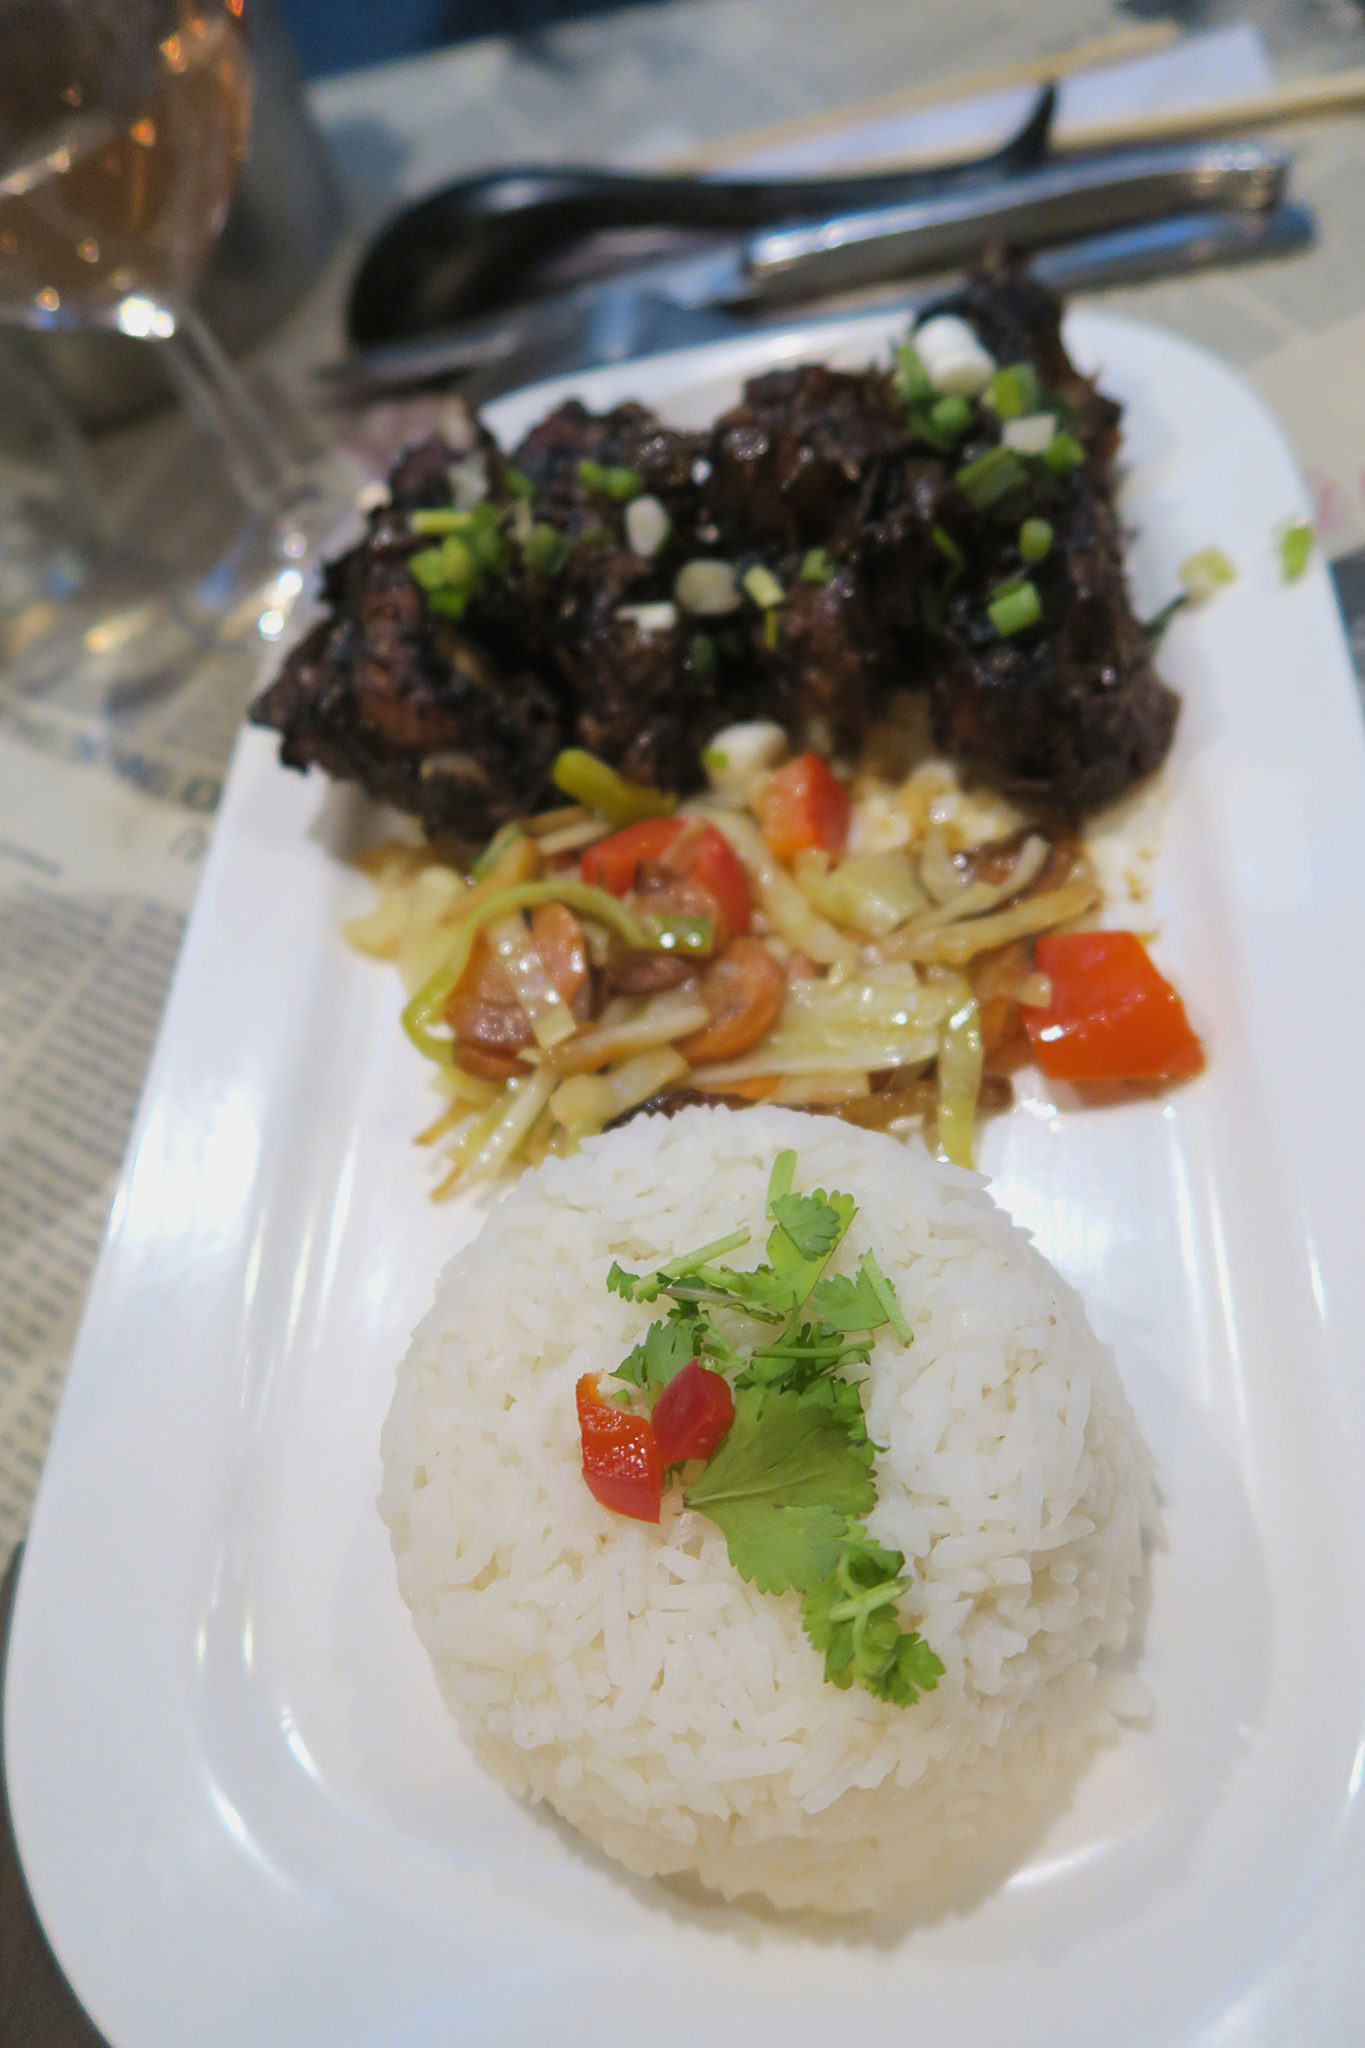 Hema_Aname_bistrot_vietnamien_plat_paris_restaurant_cuisine_monde